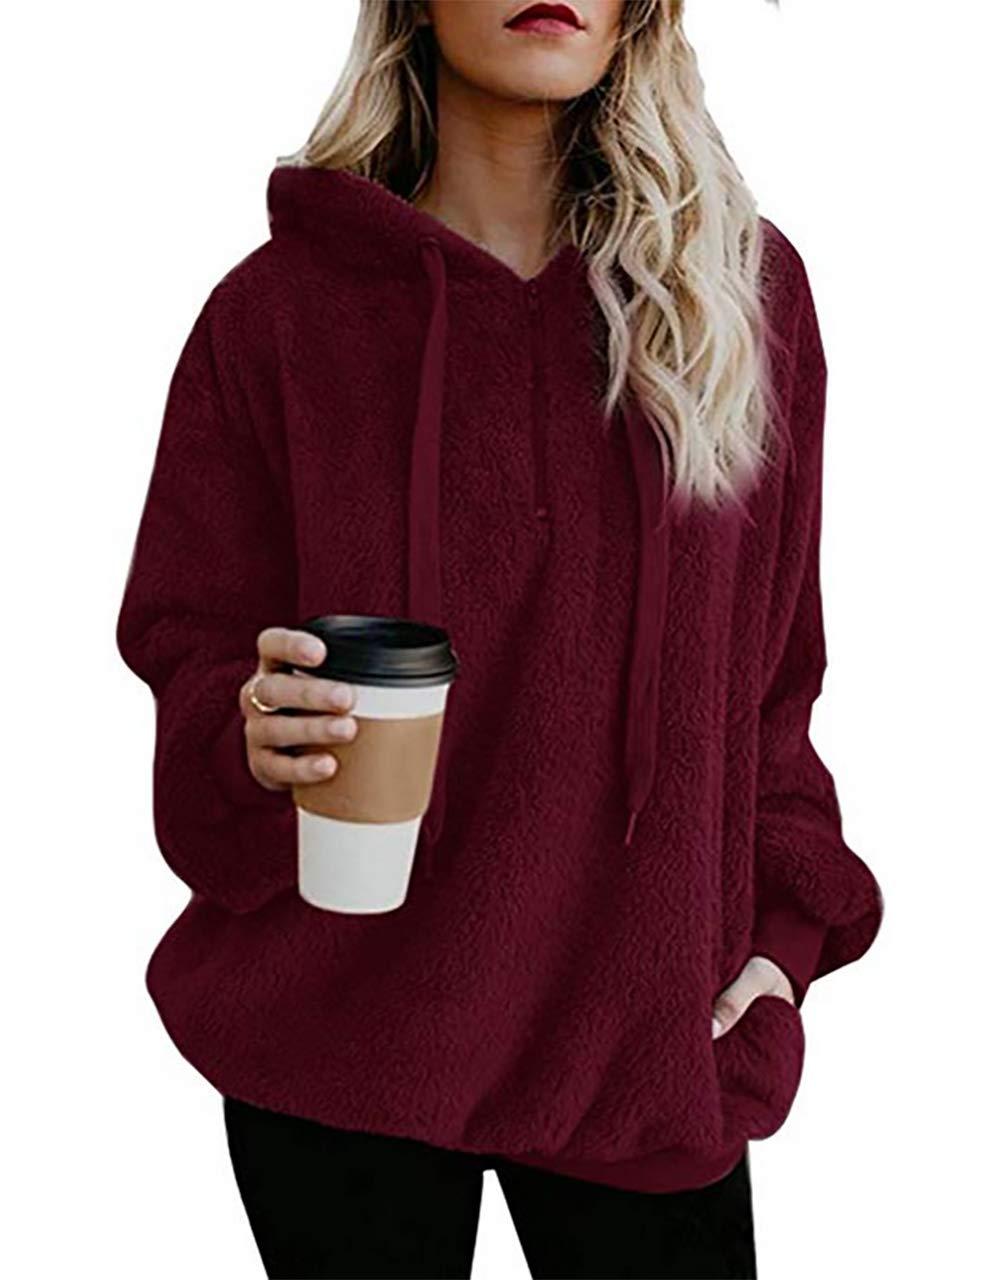 Lovelyduo Women's Fuzzy Long Sleeve Pullover Hoodie Zip Front Sweatshirt Wine Red L